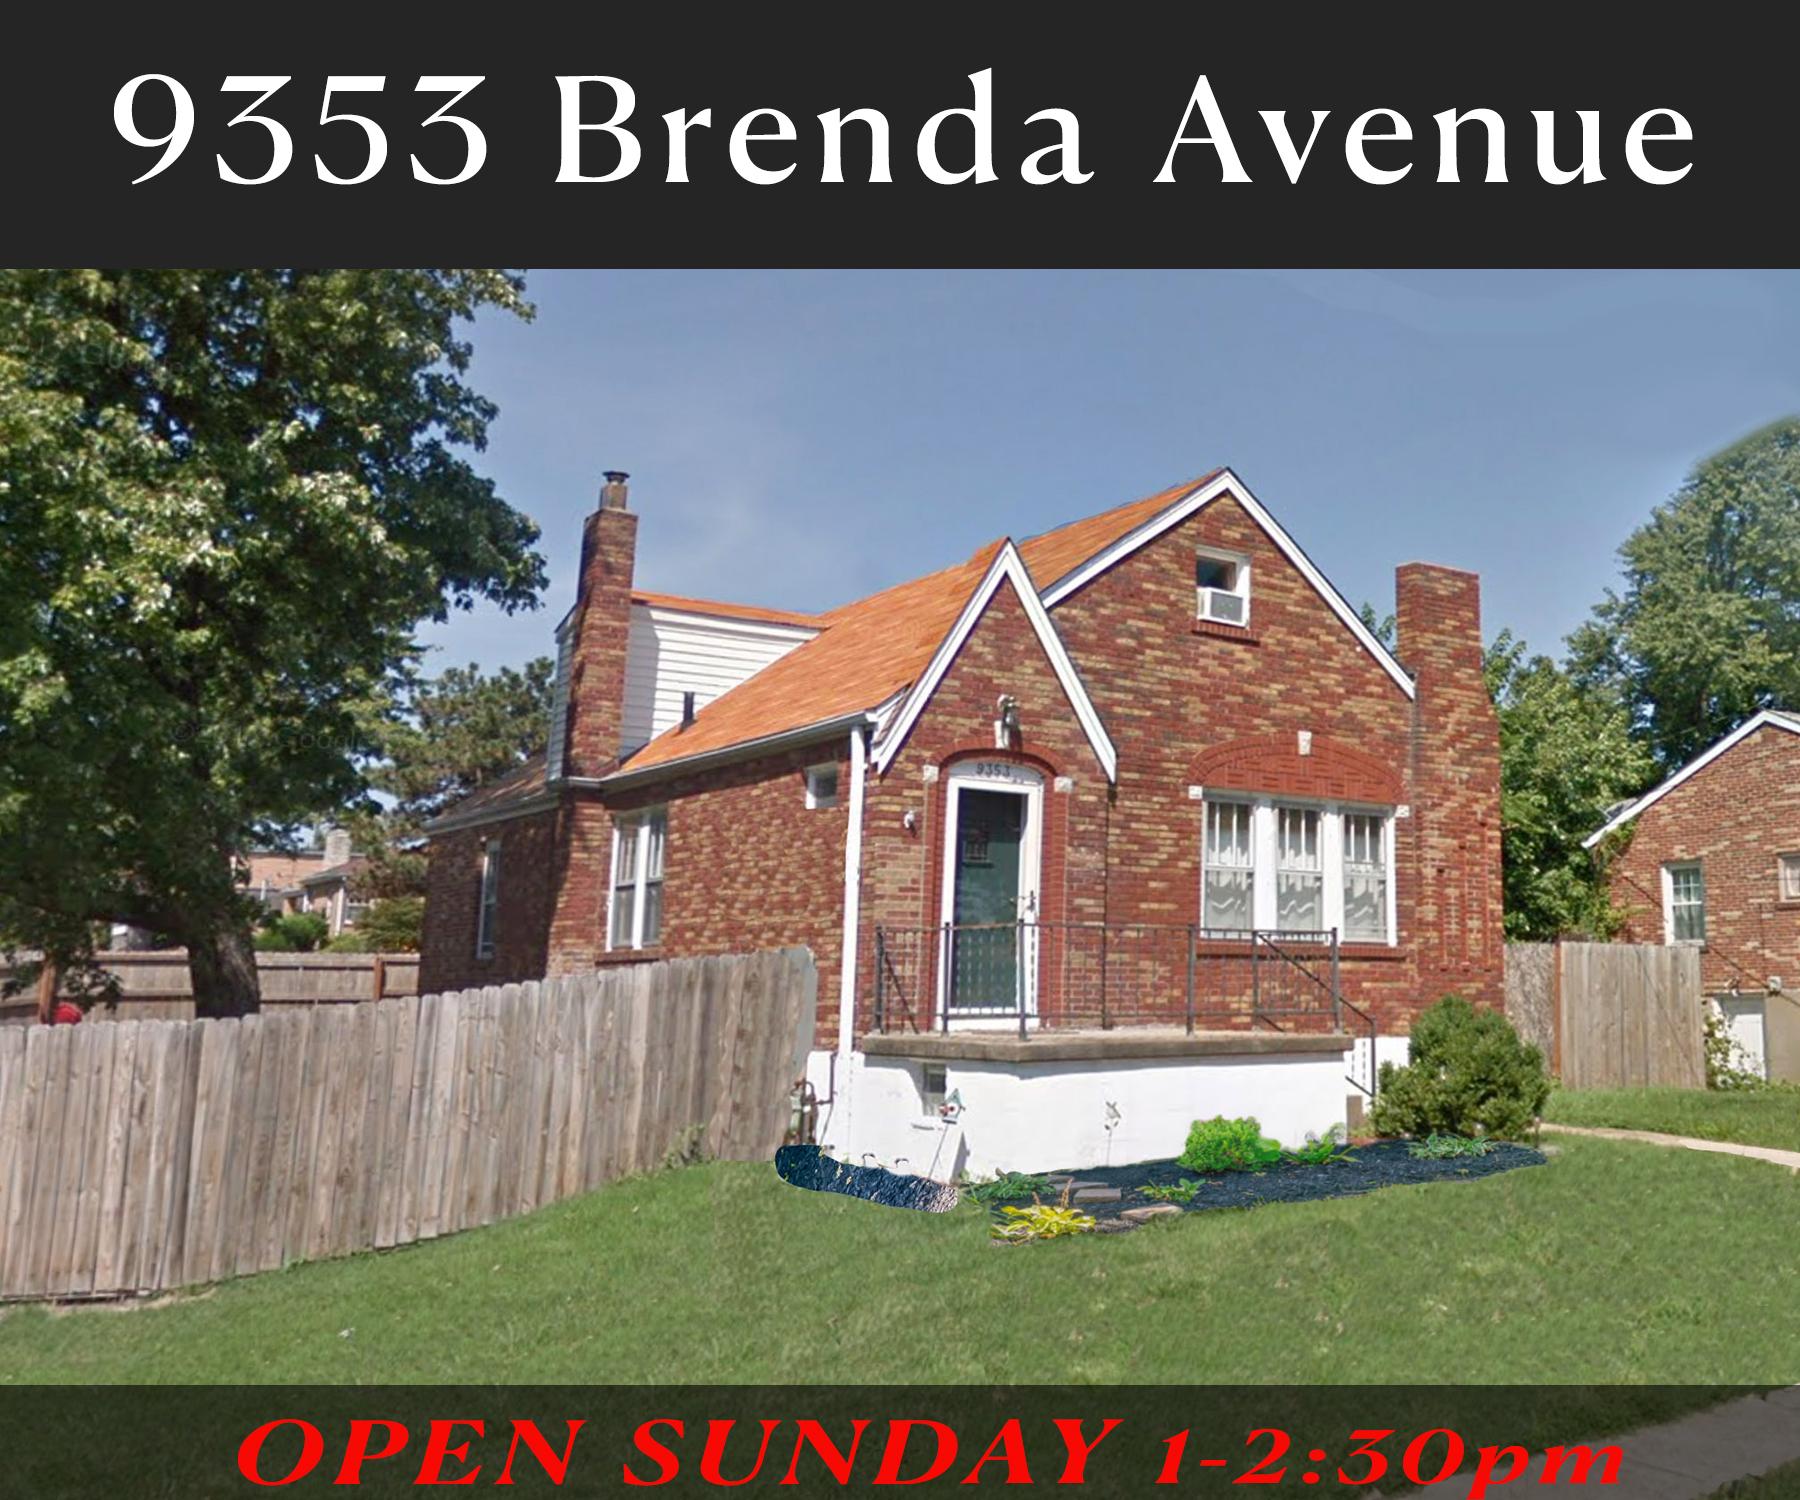 9353 Brenda Ave.   Affton, MO. 63123 FOR SALE,